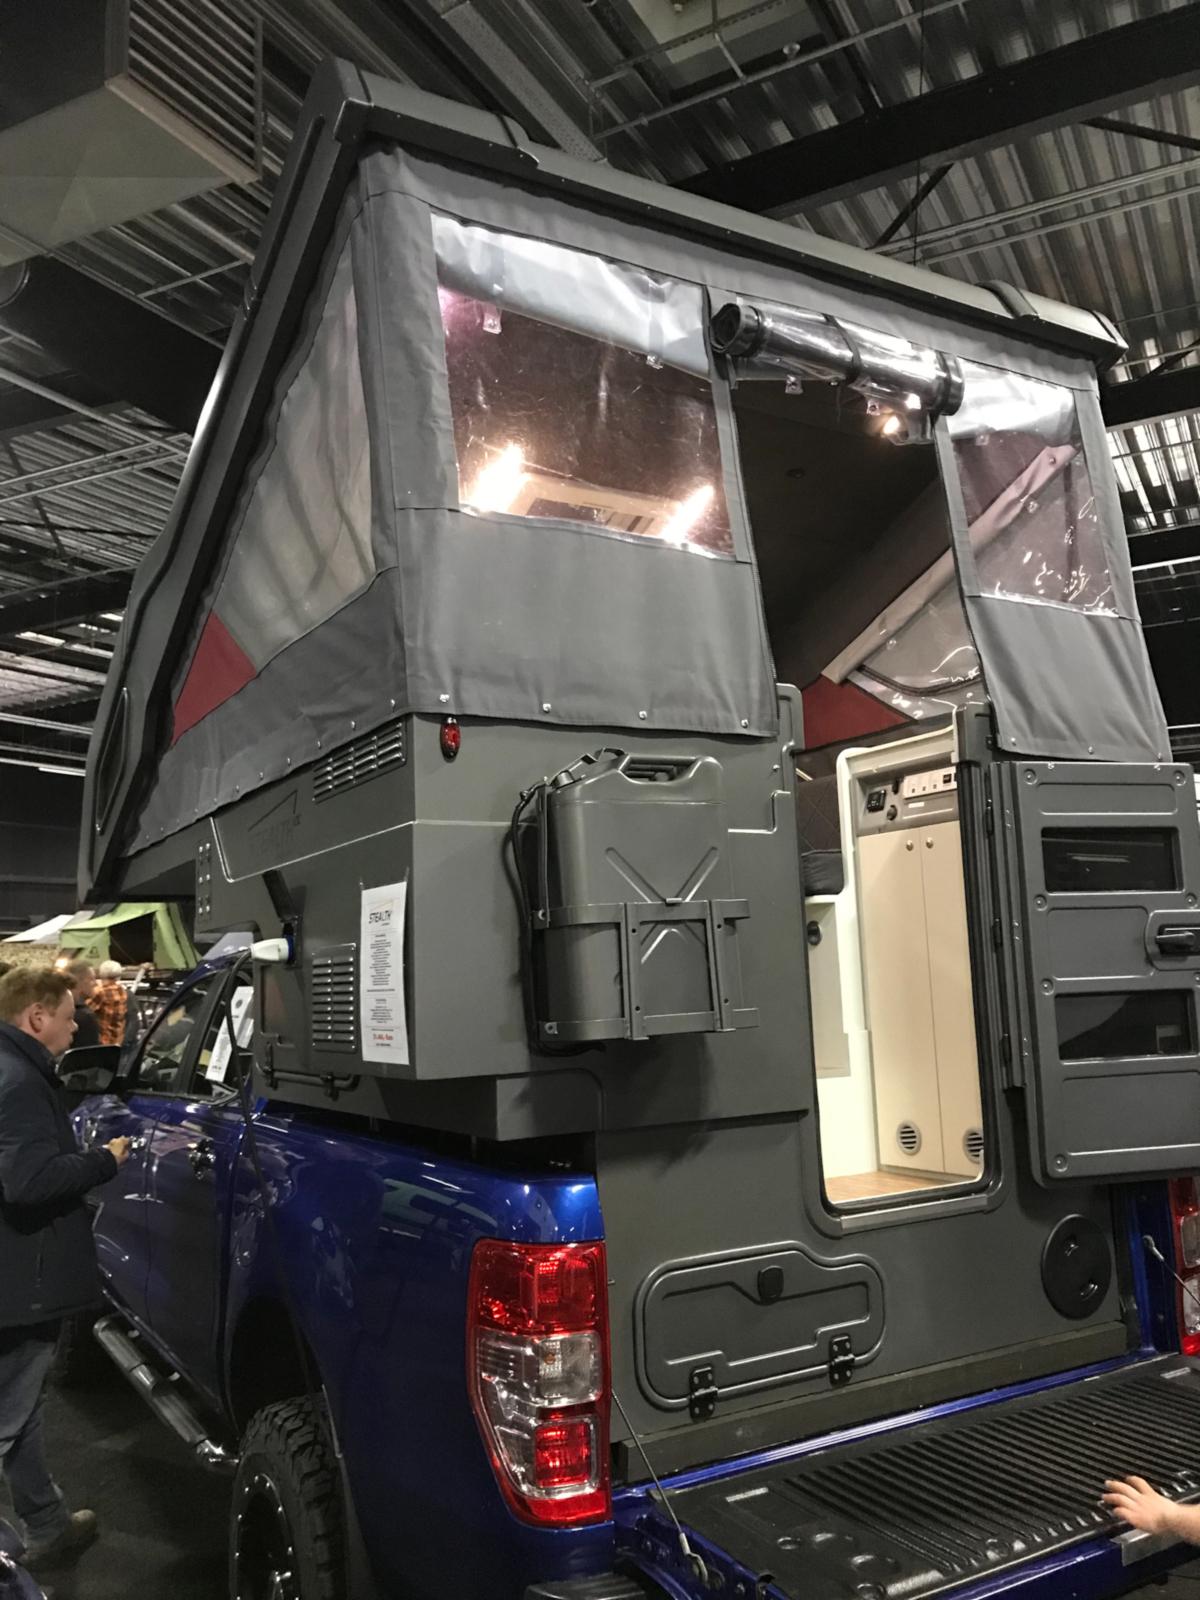 4x4-Rhein-Waal 2019 - Das Dach hochgefahren - Camp-Crown Absetzkabine.